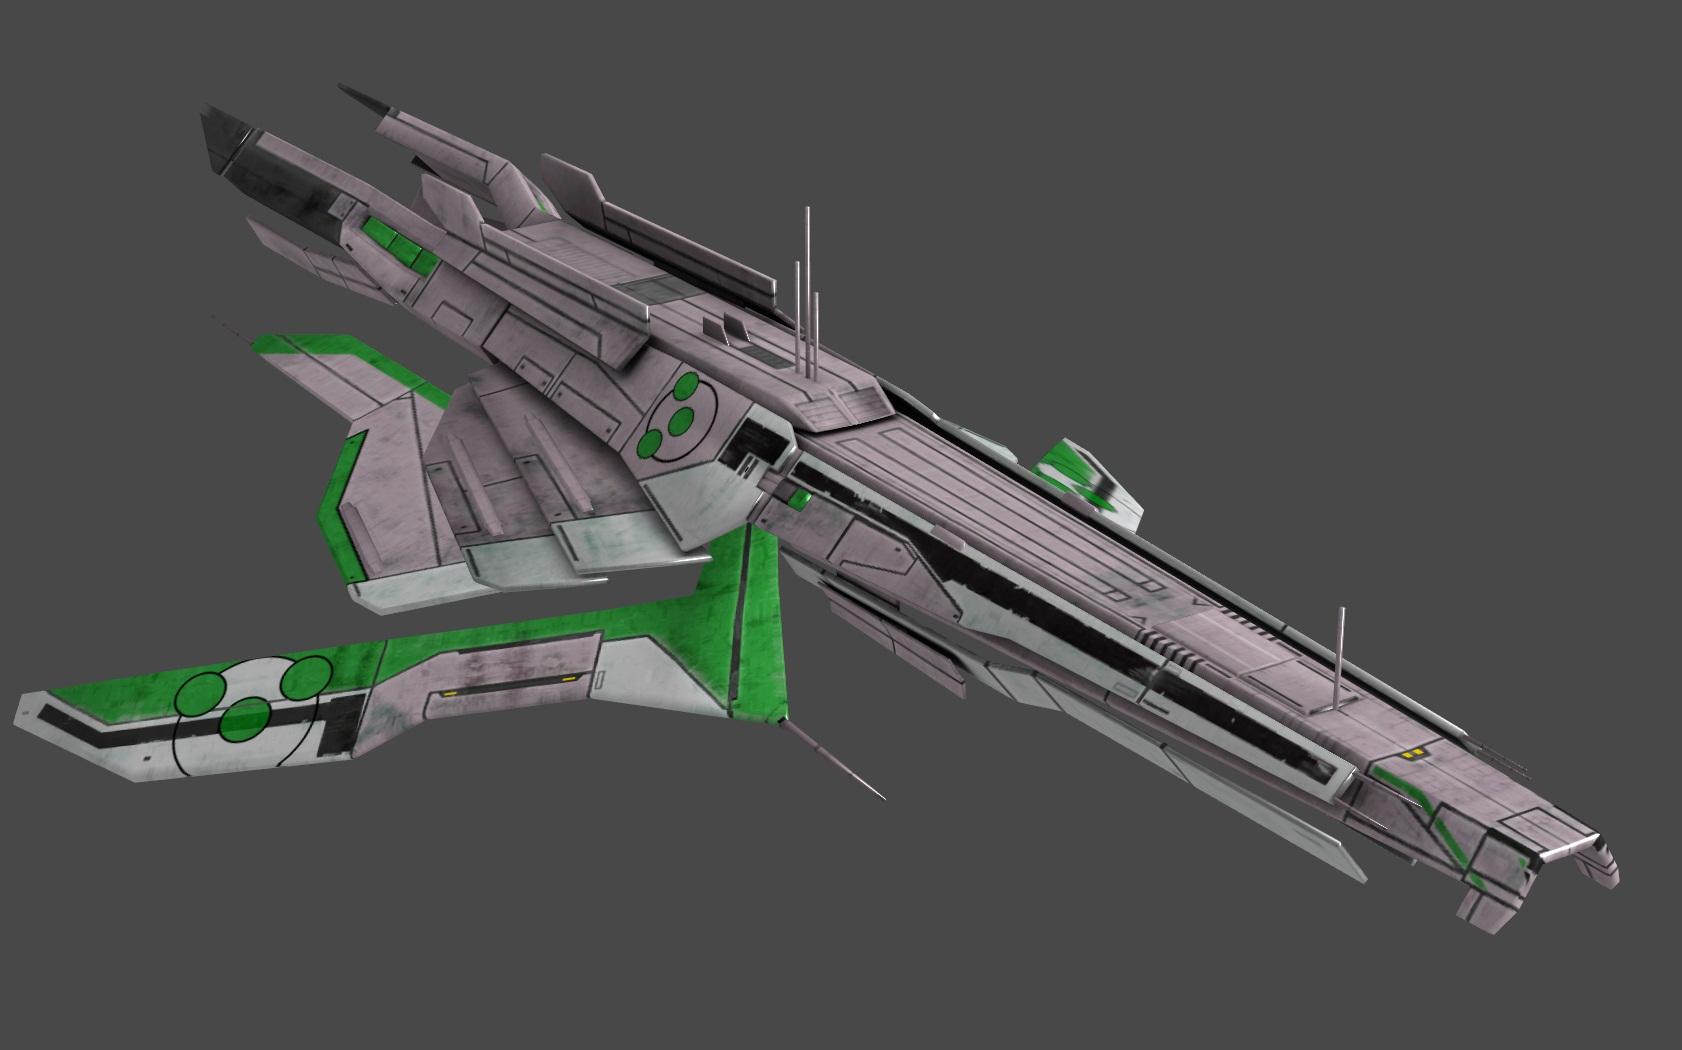 Volus Dreadnought Kwunu For Xnalara By Melllin On Deviantart